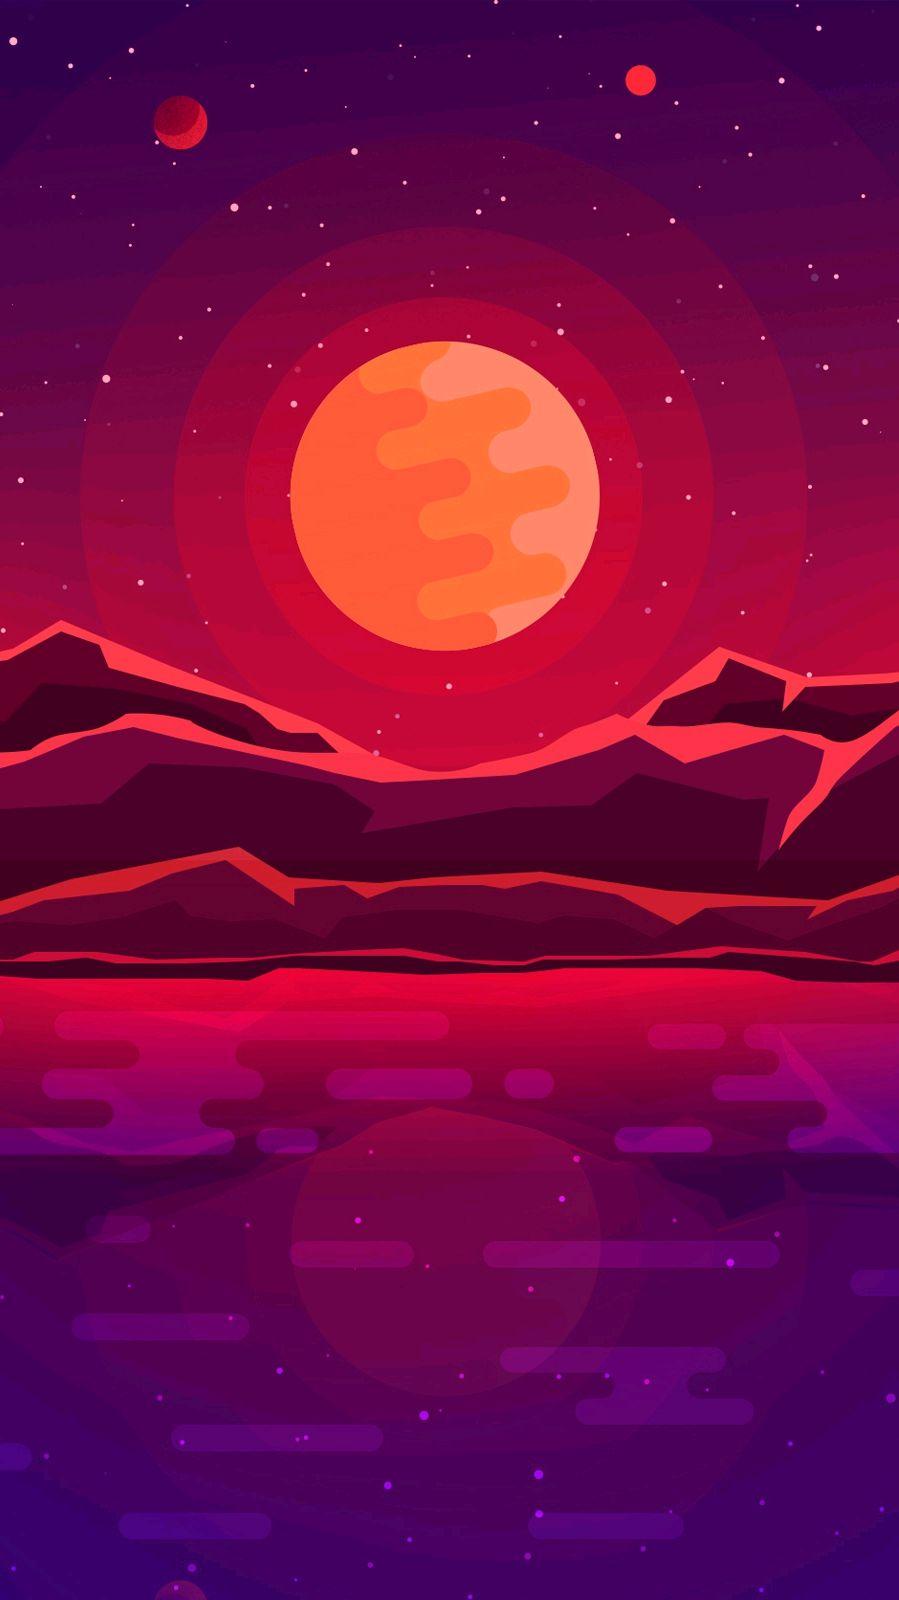 Digital Sunrise Minimal Art iPhone Wallpaper